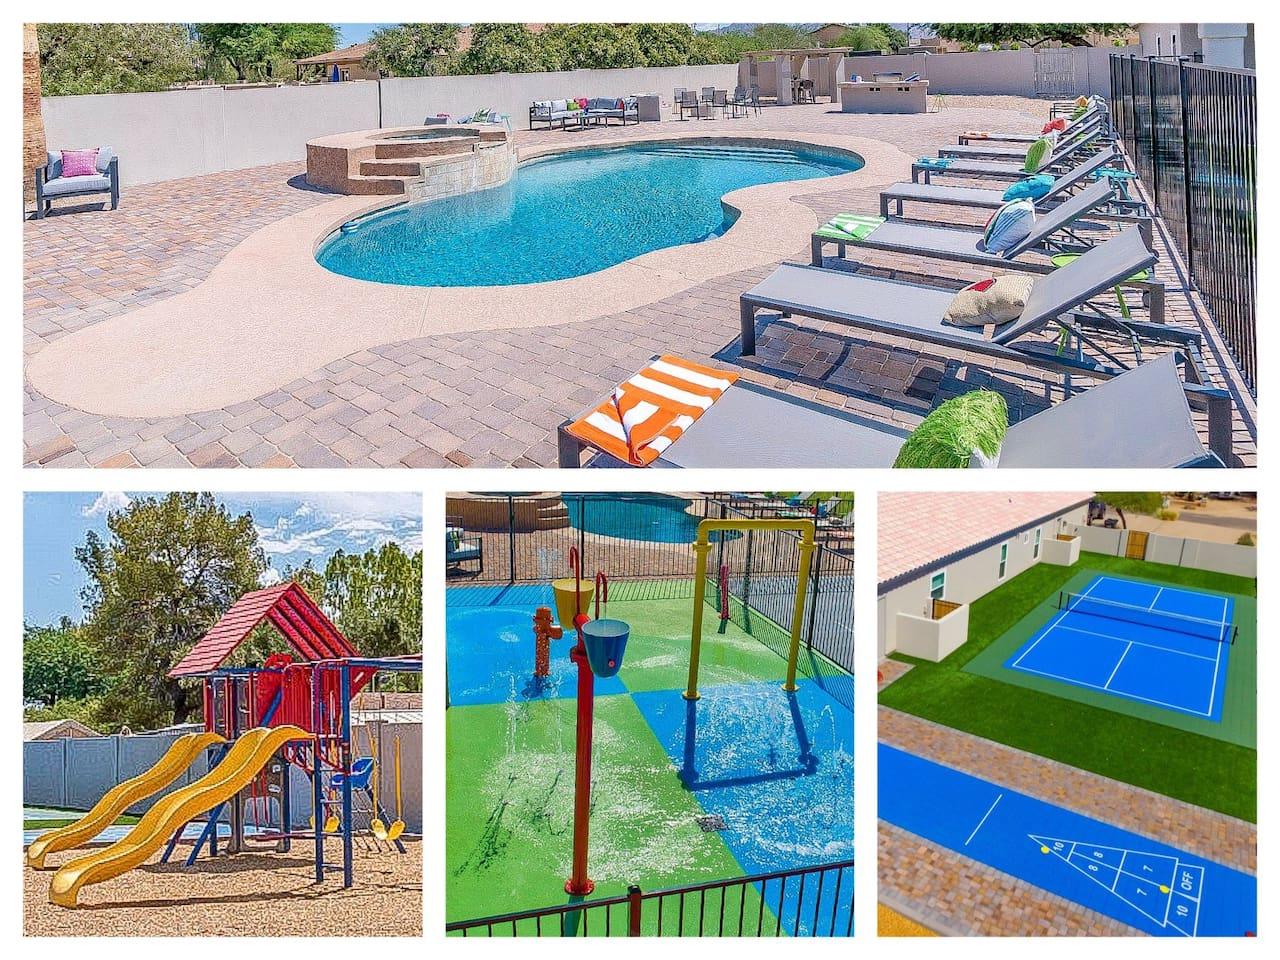 Pool, Hot Tub, Playground, Splashpad, Pickleball Court, Shuffleboard